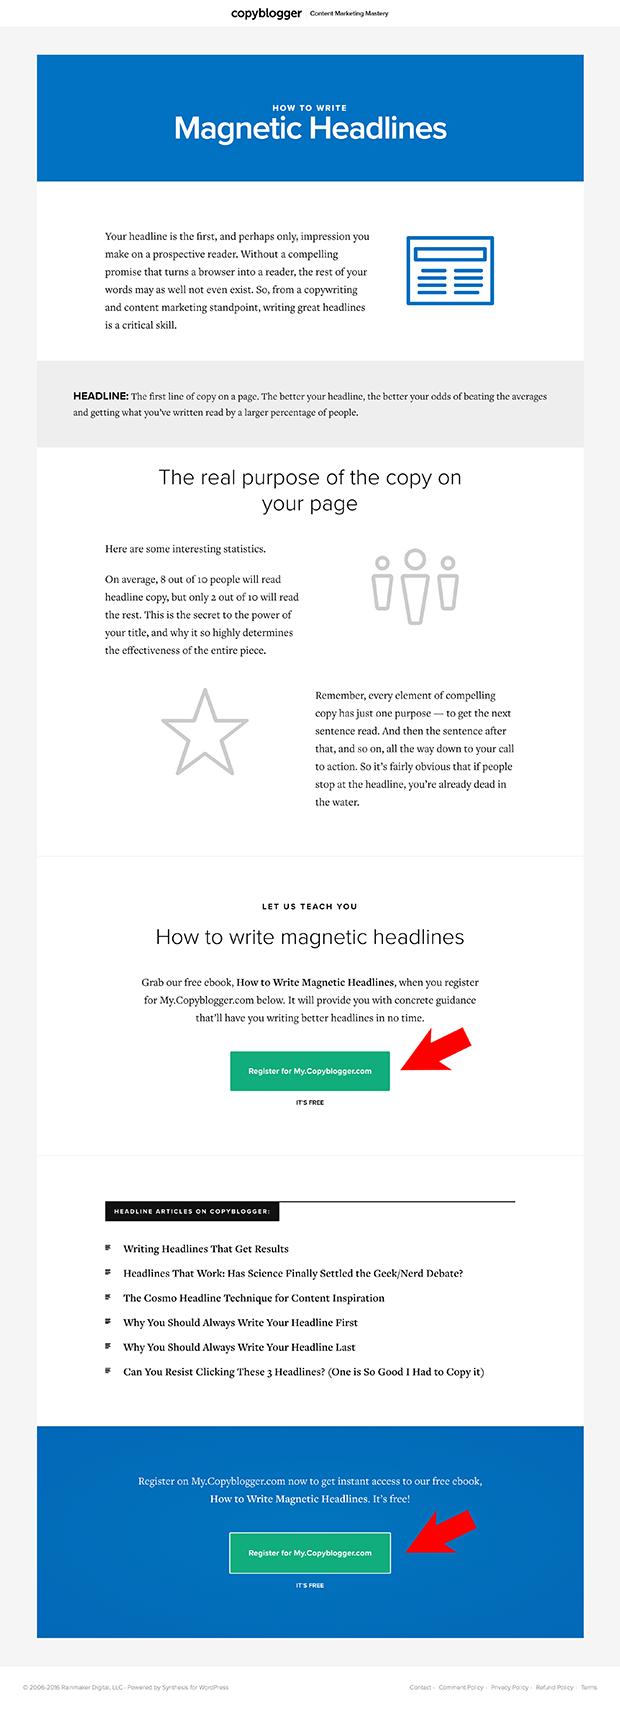 Copyblogger Resource Page